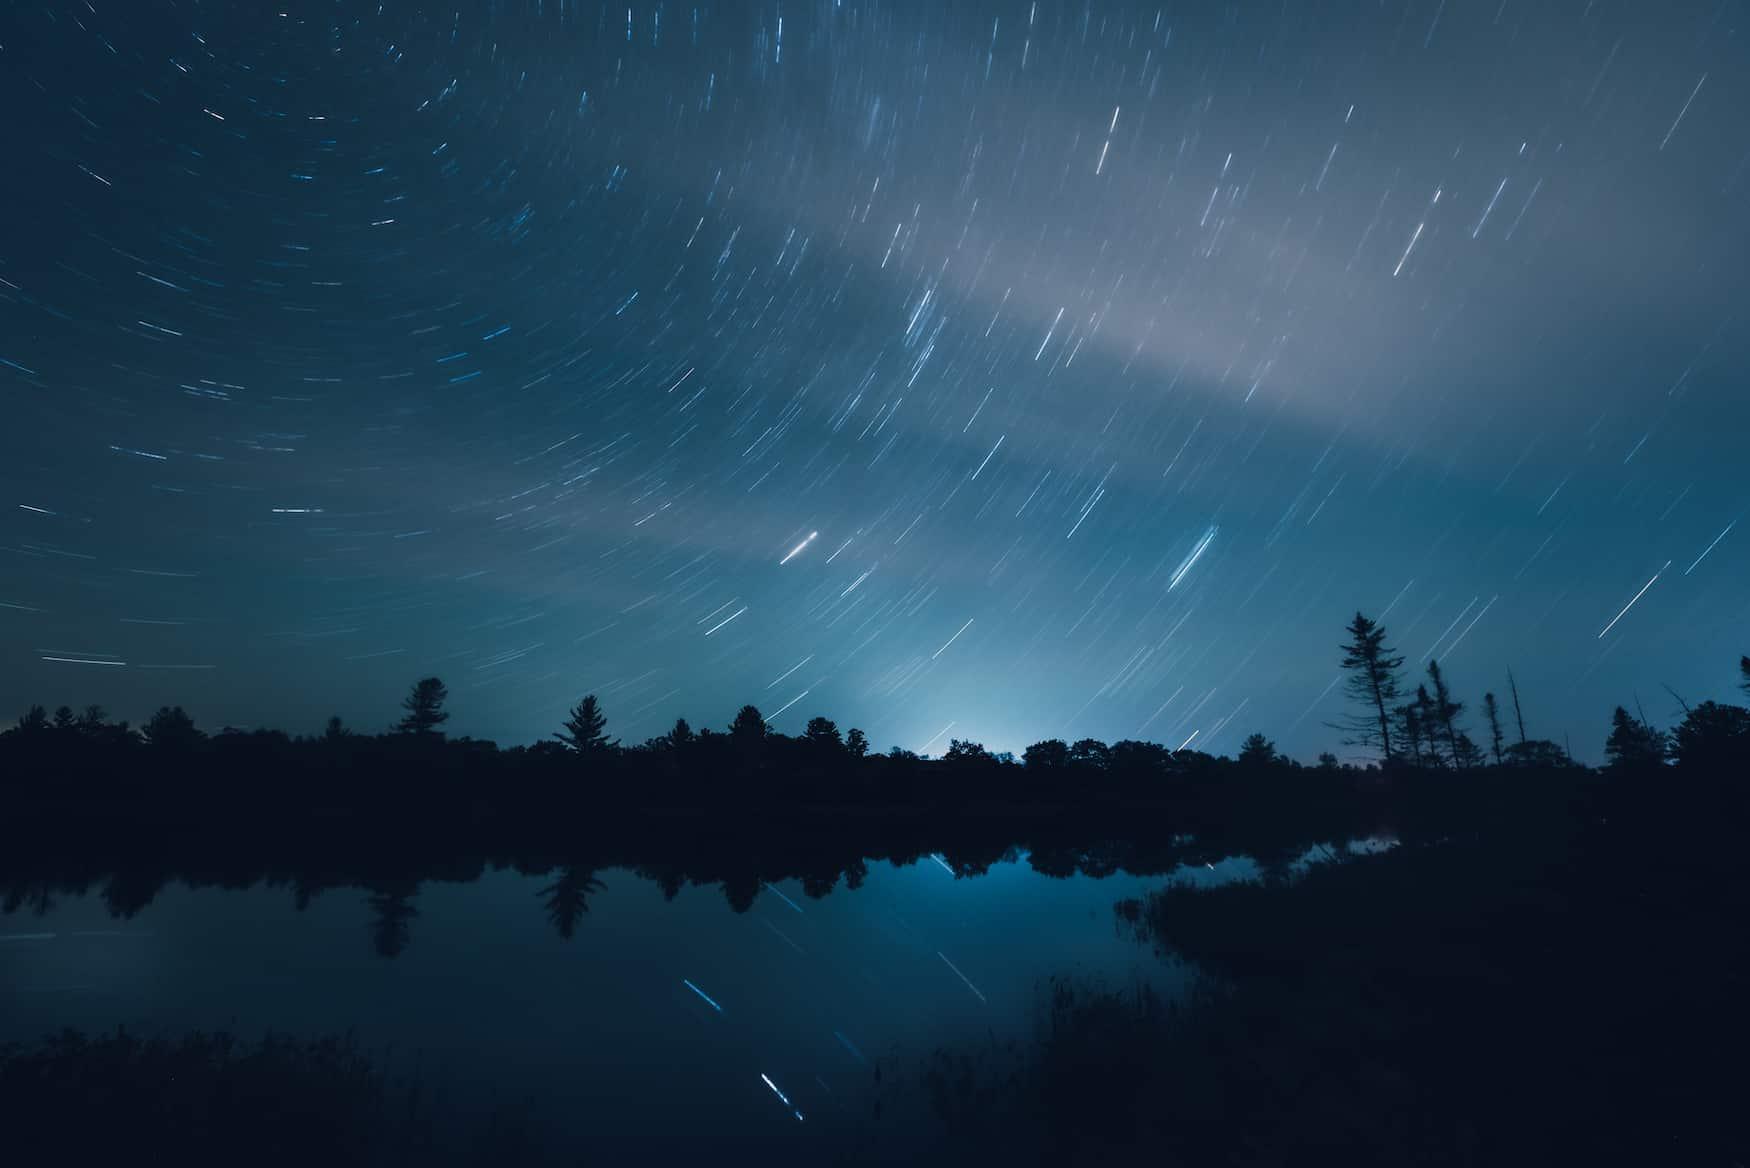 Star Trails im Dark Sky Reserve Torrance Barrens in Muskoka